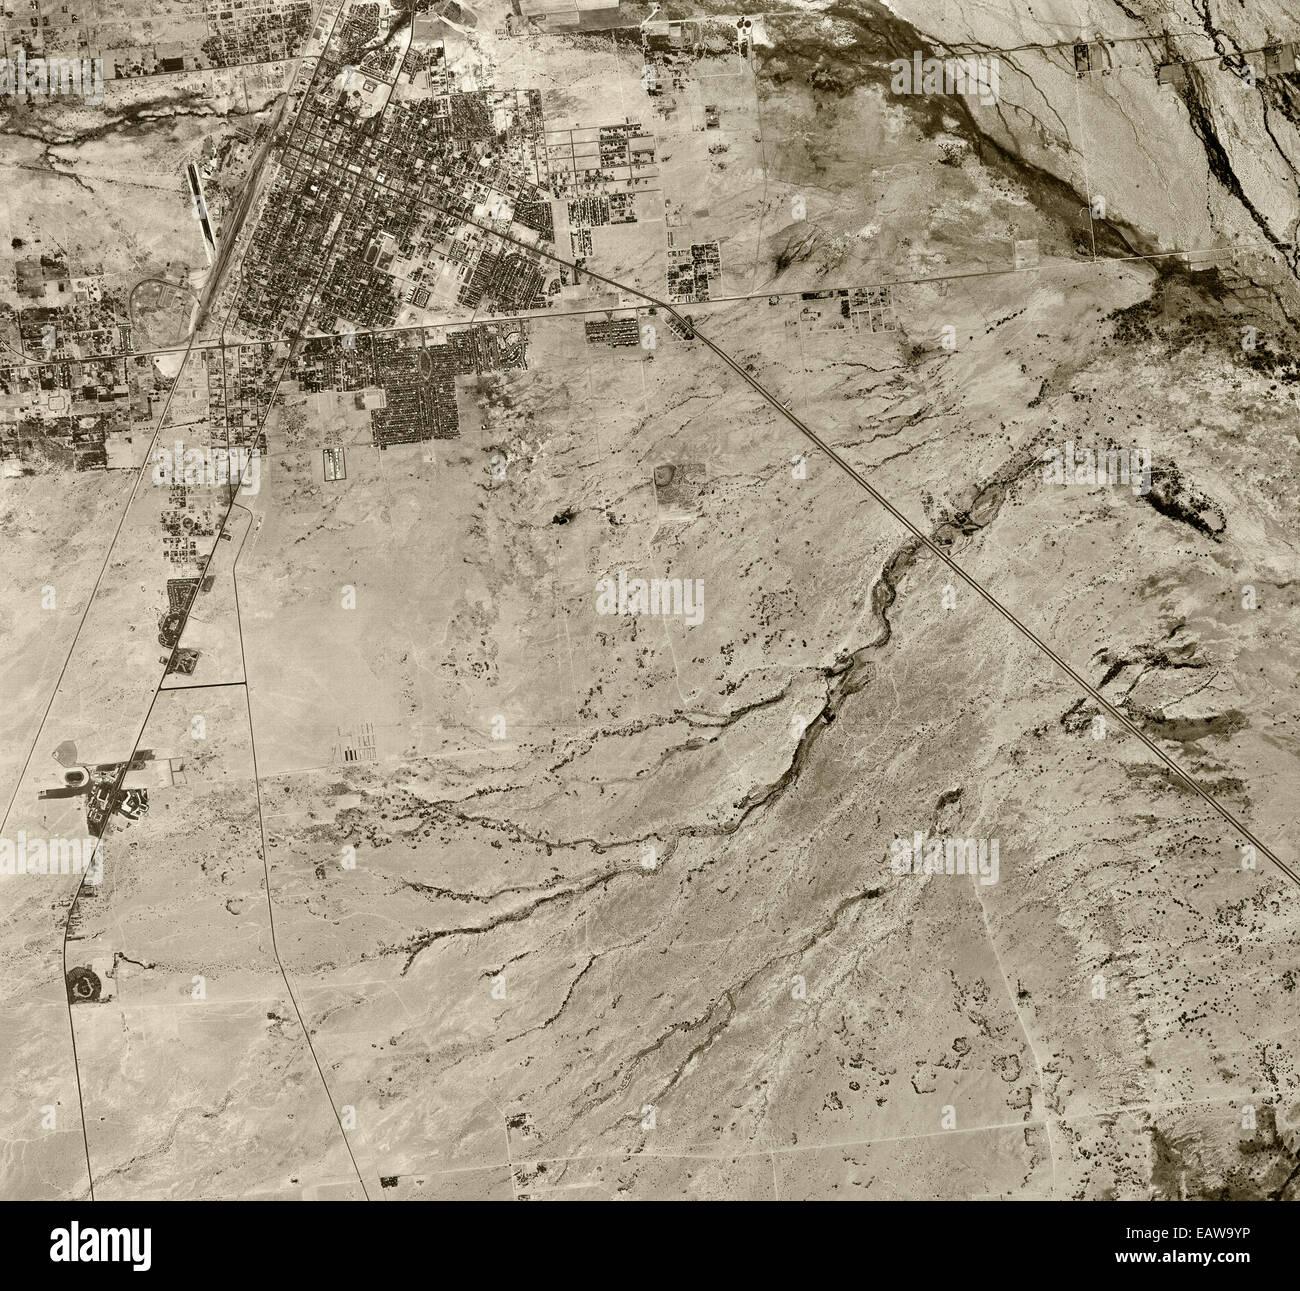 historical aerial photograph Las Vegas, Nevada, 1950 - Stock Image